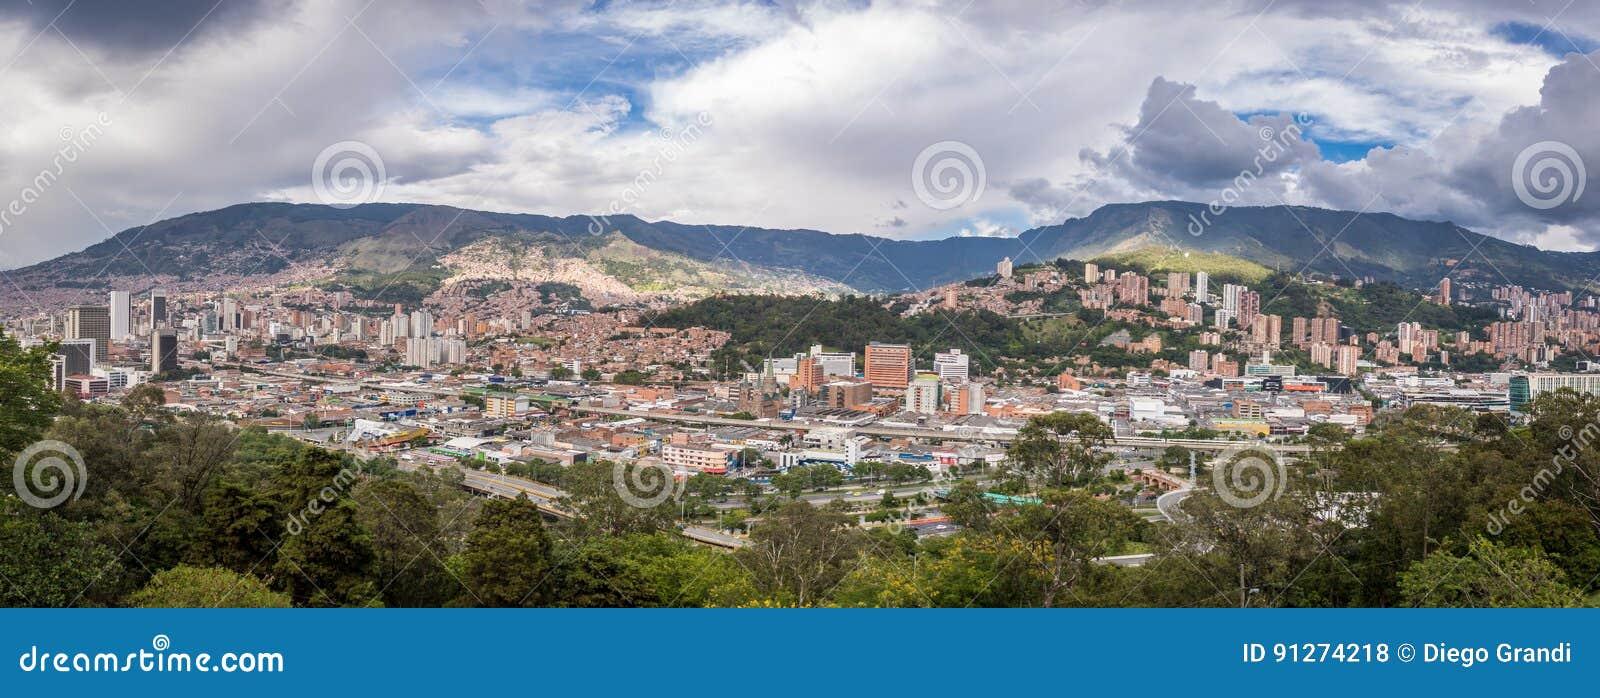 Panorama van Medellin, Colombia